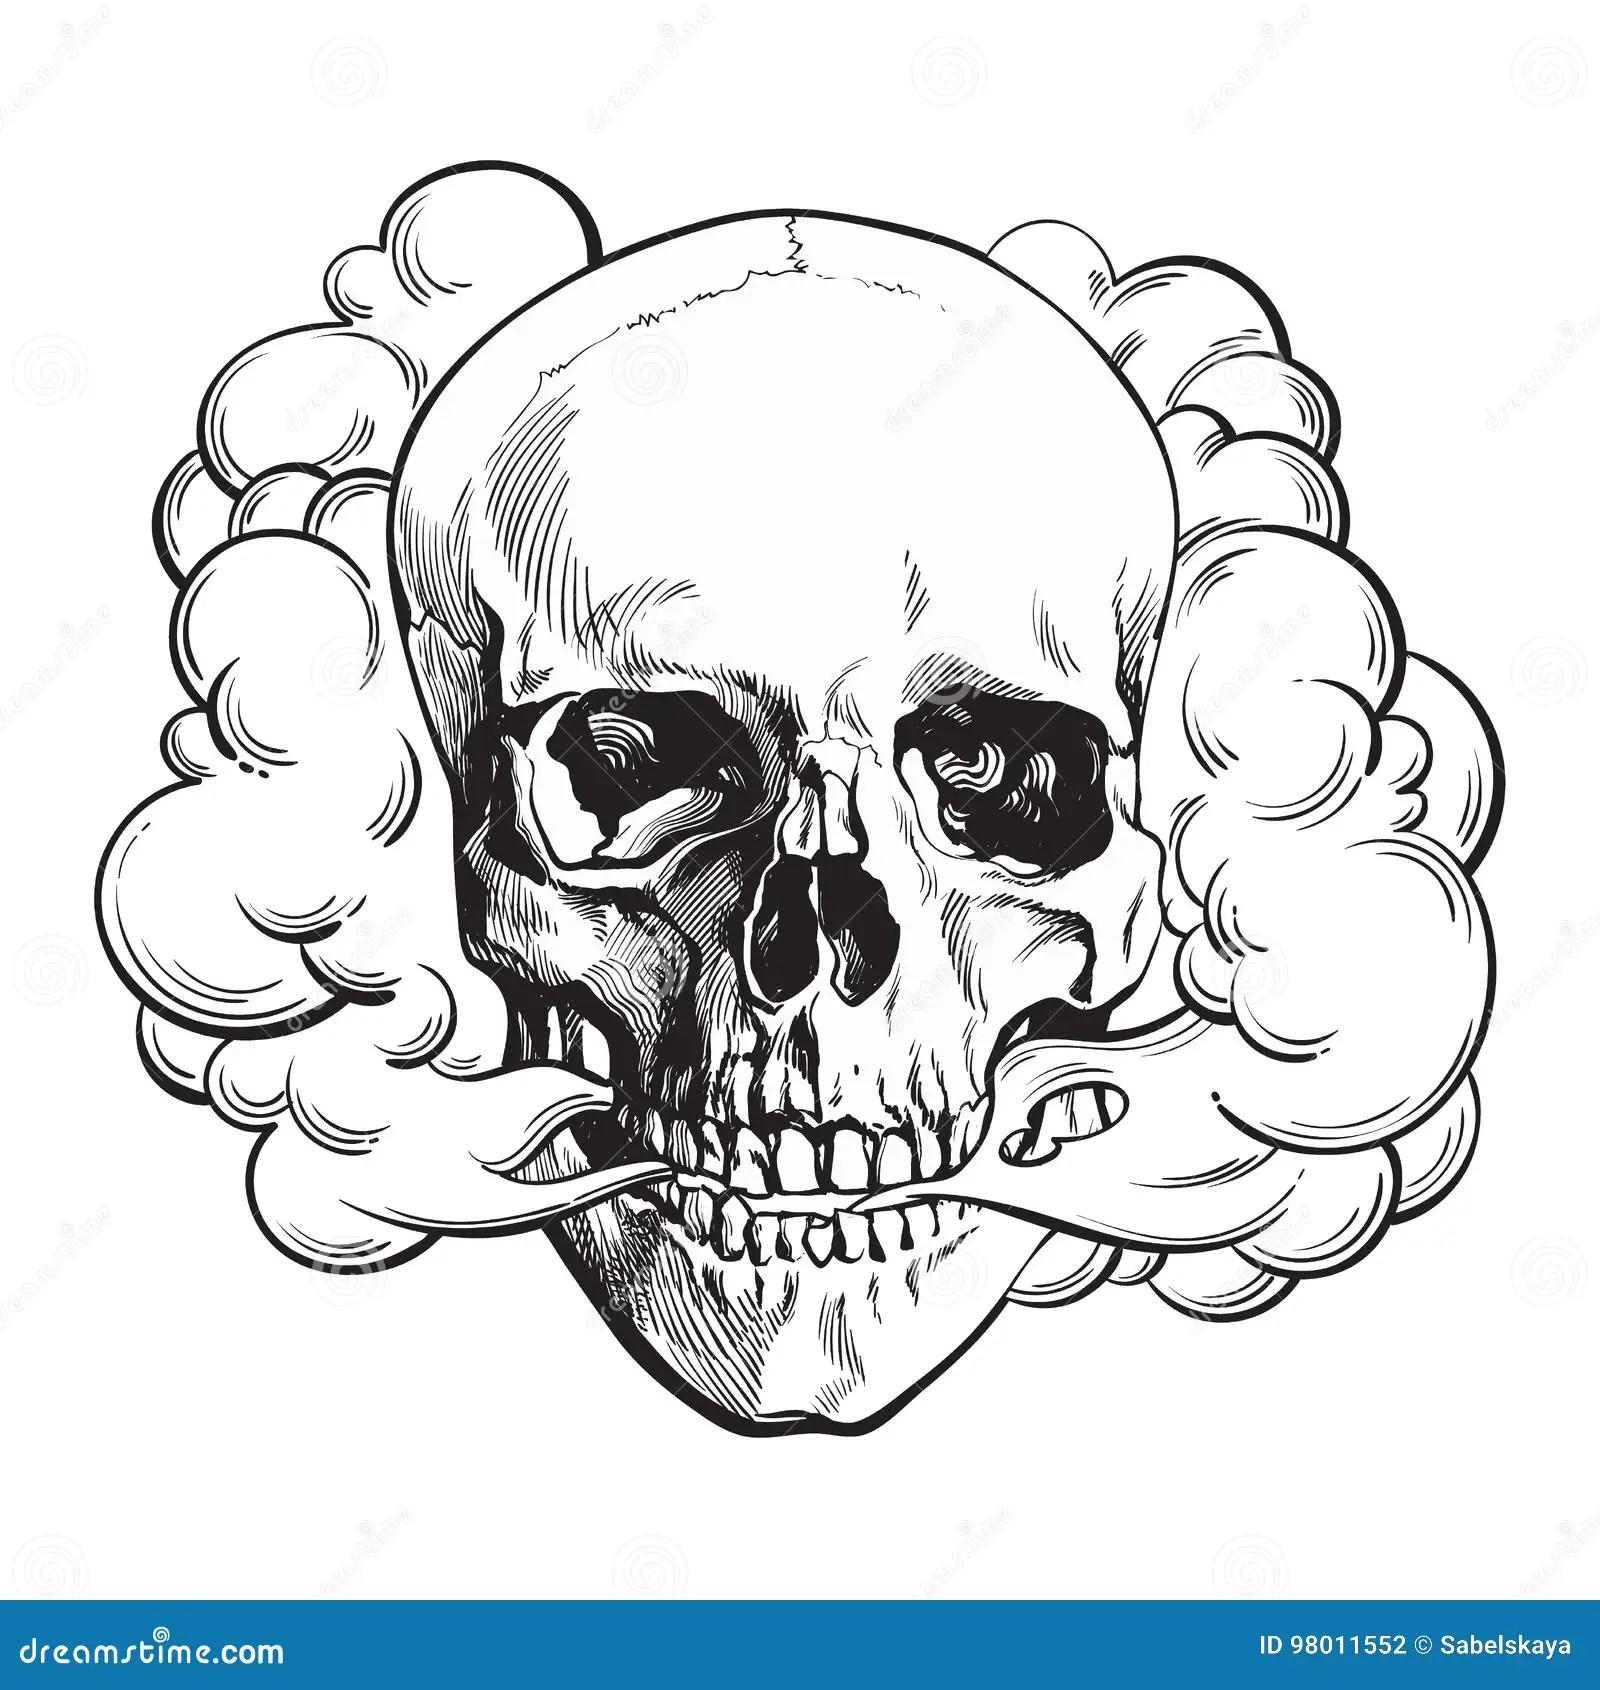 Smoke Coming Out Of Fleshless Skull, Death, Mortal Habit